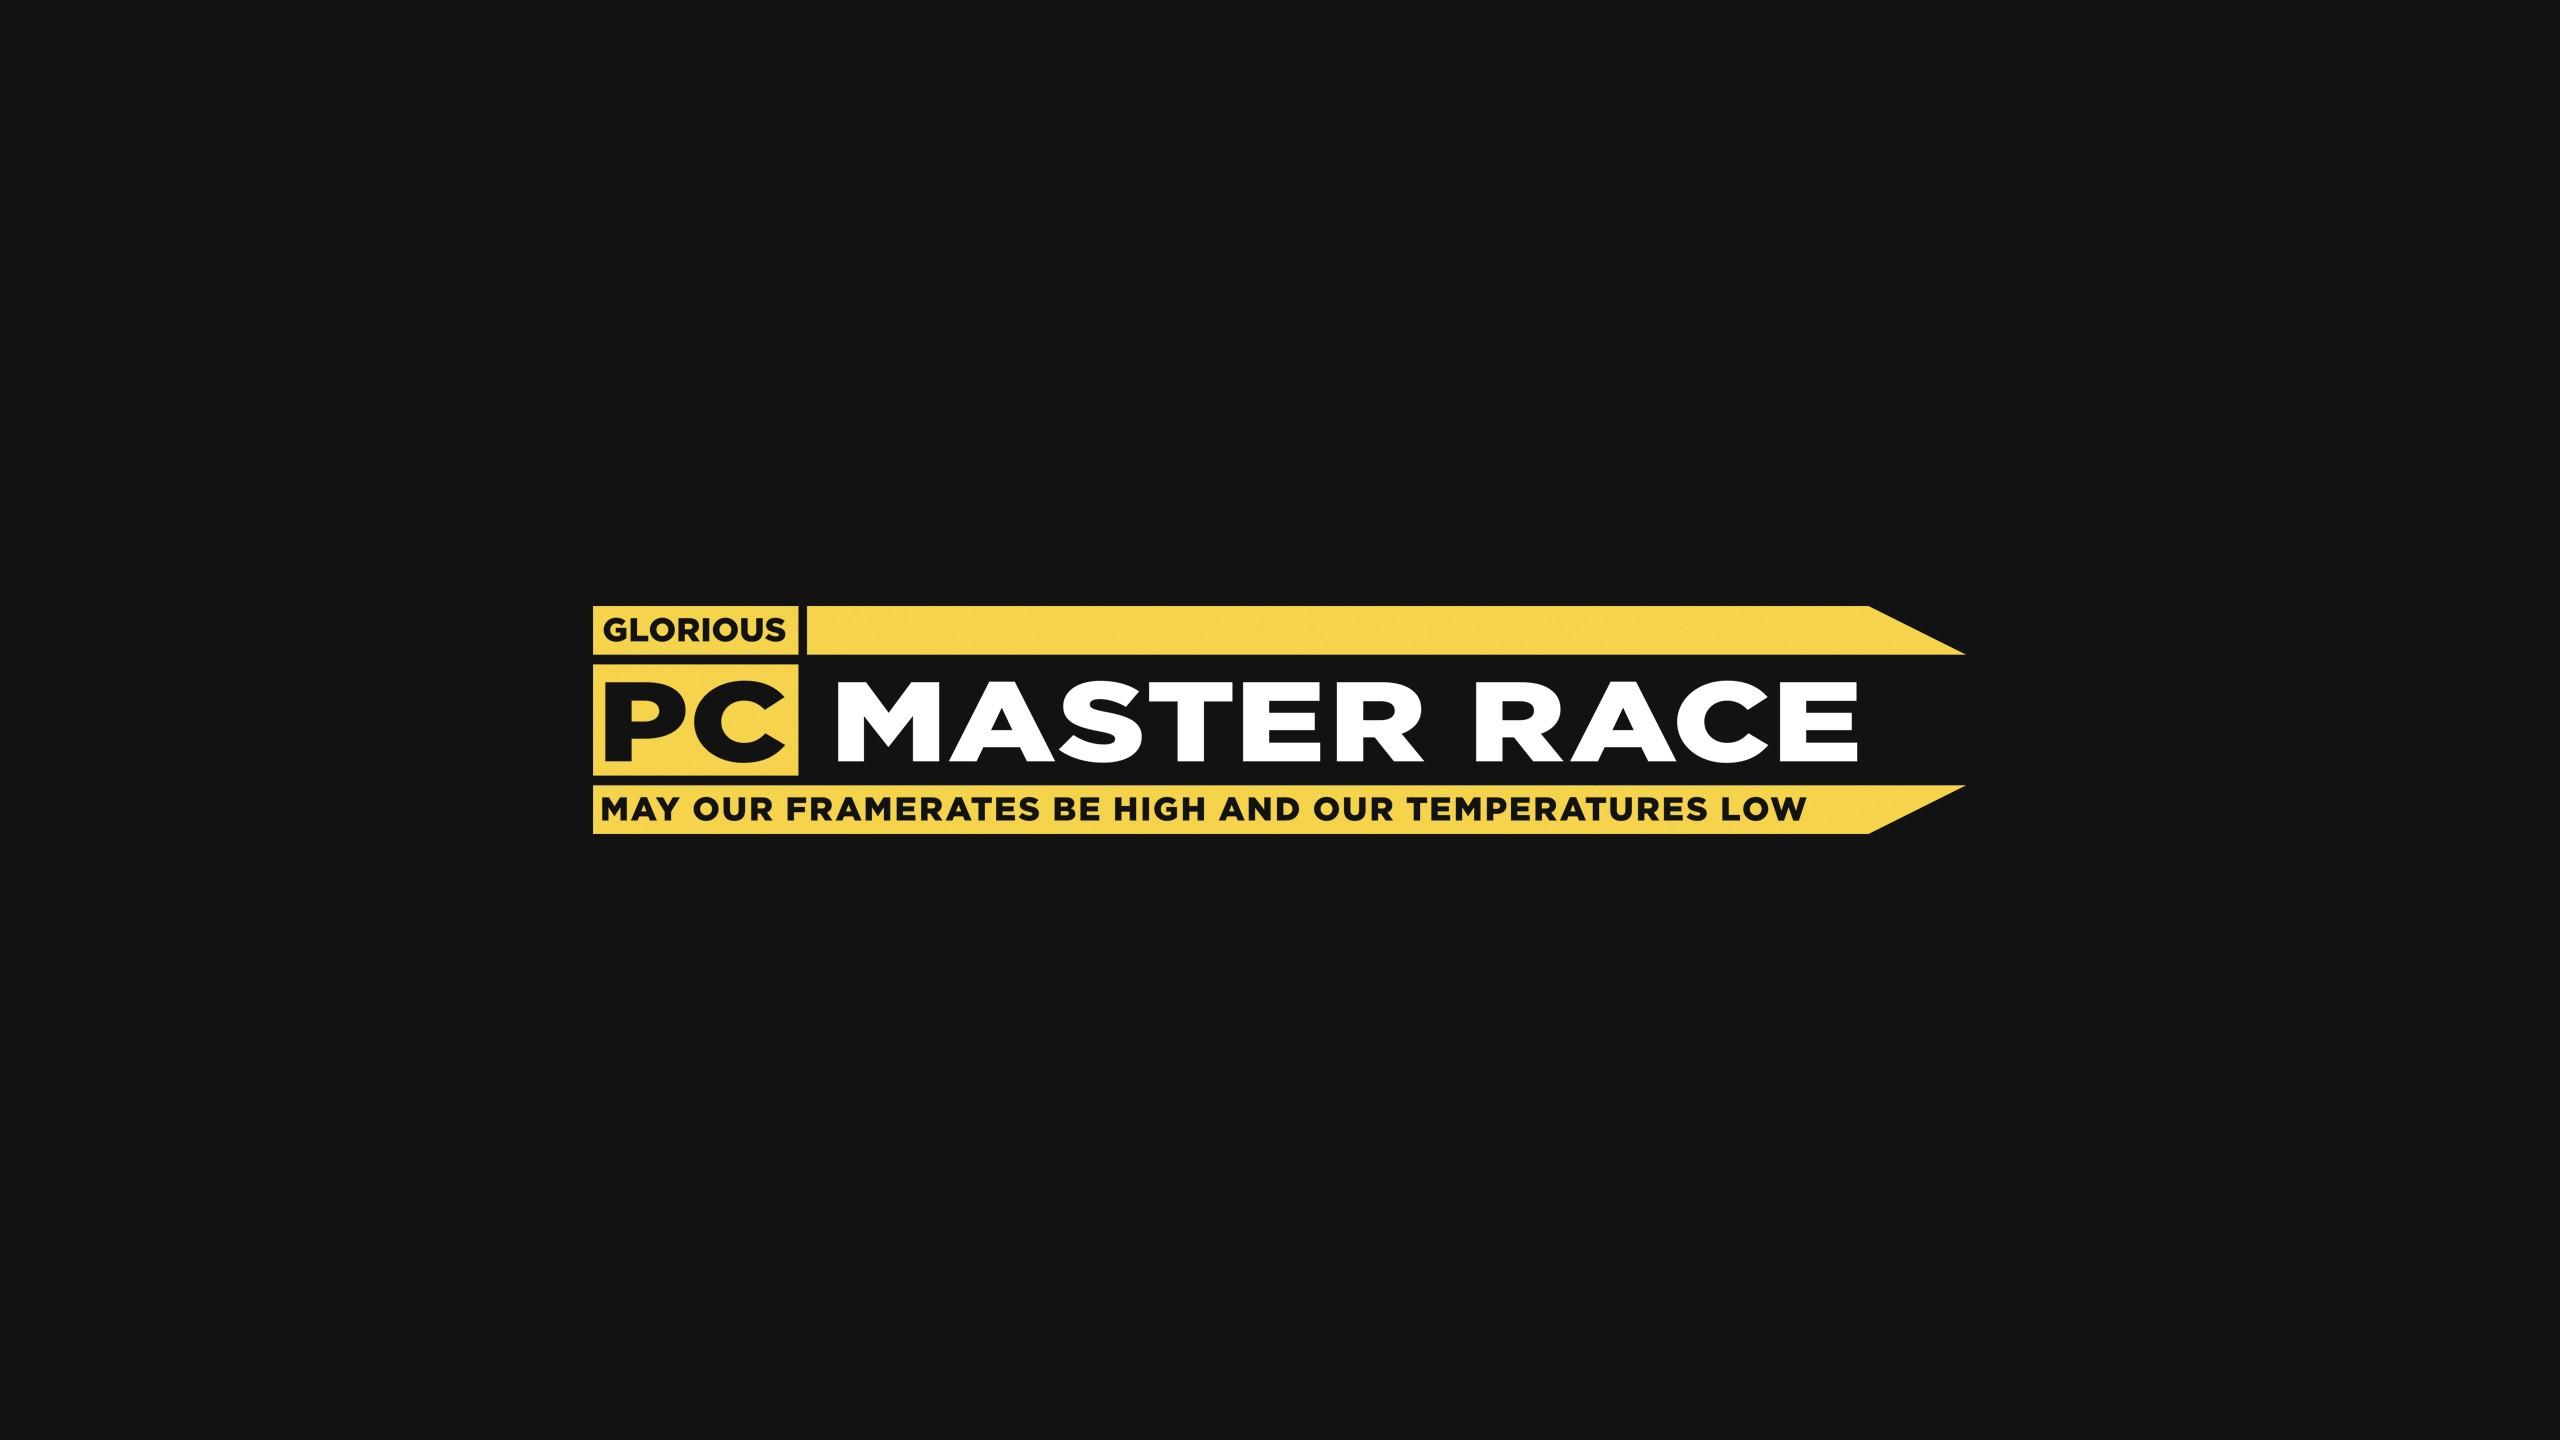 General 2560x1440 PC gaming text minimalism humor